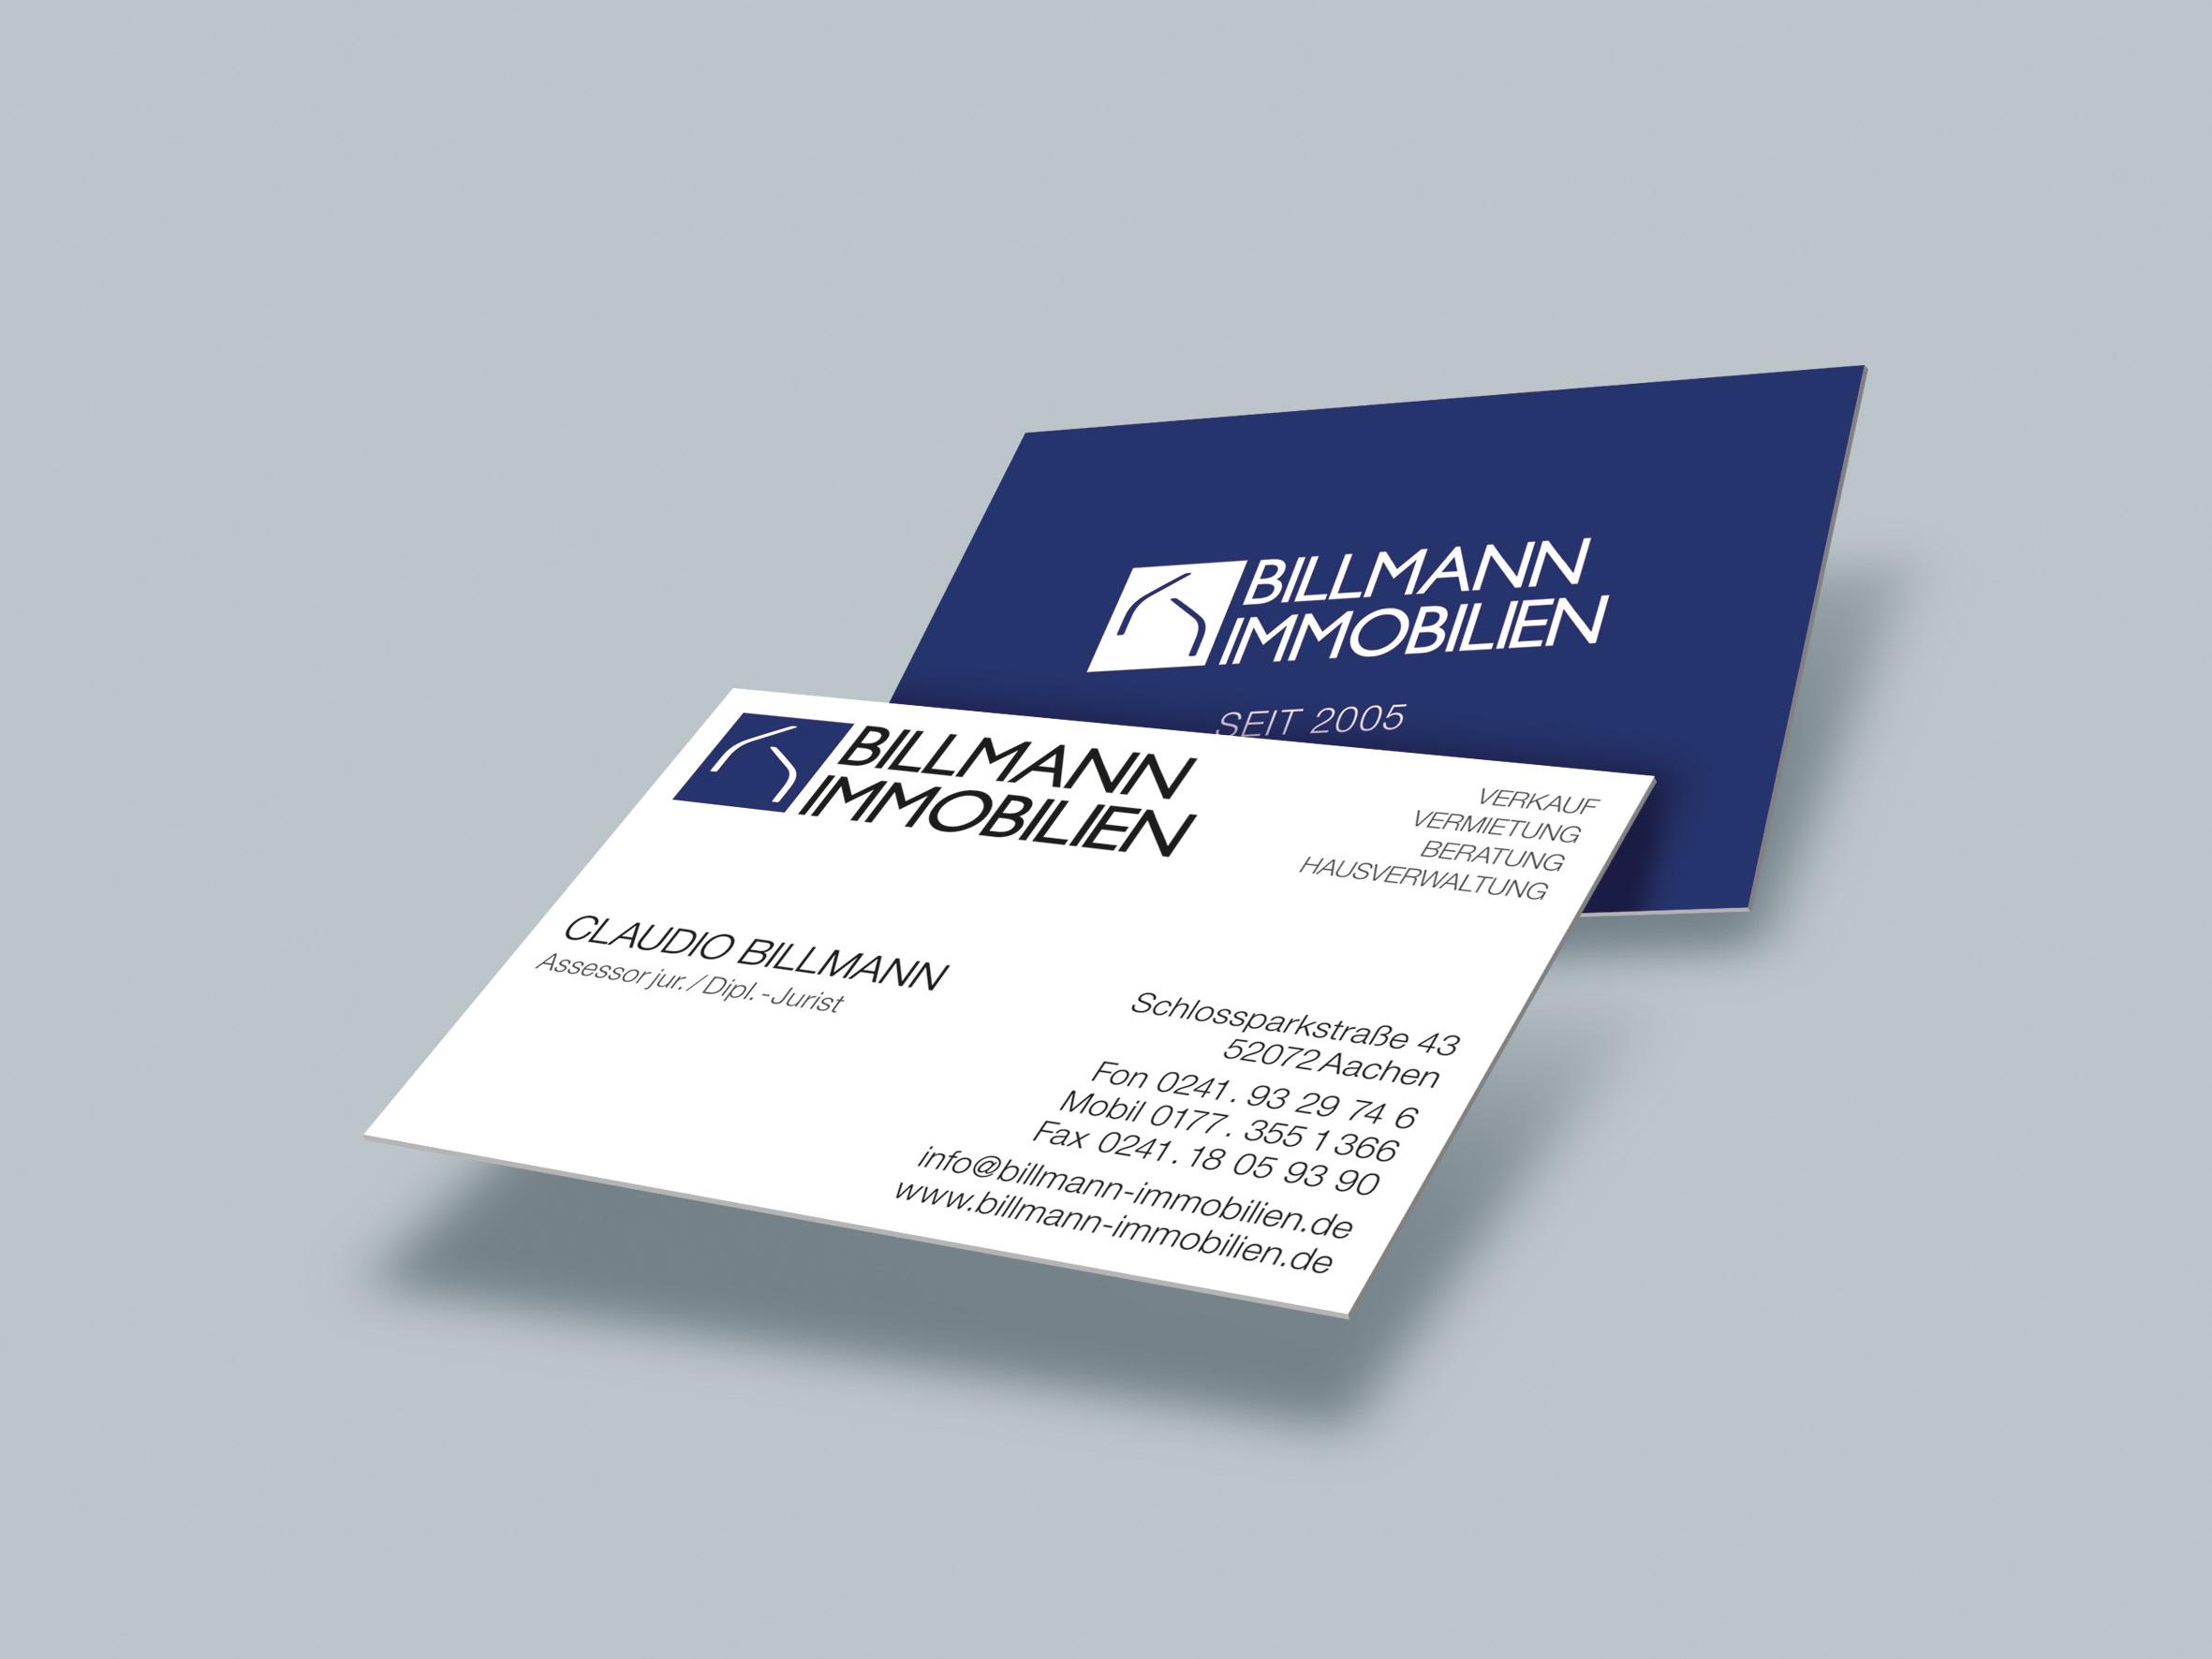 Billmann Visitenkarte 01